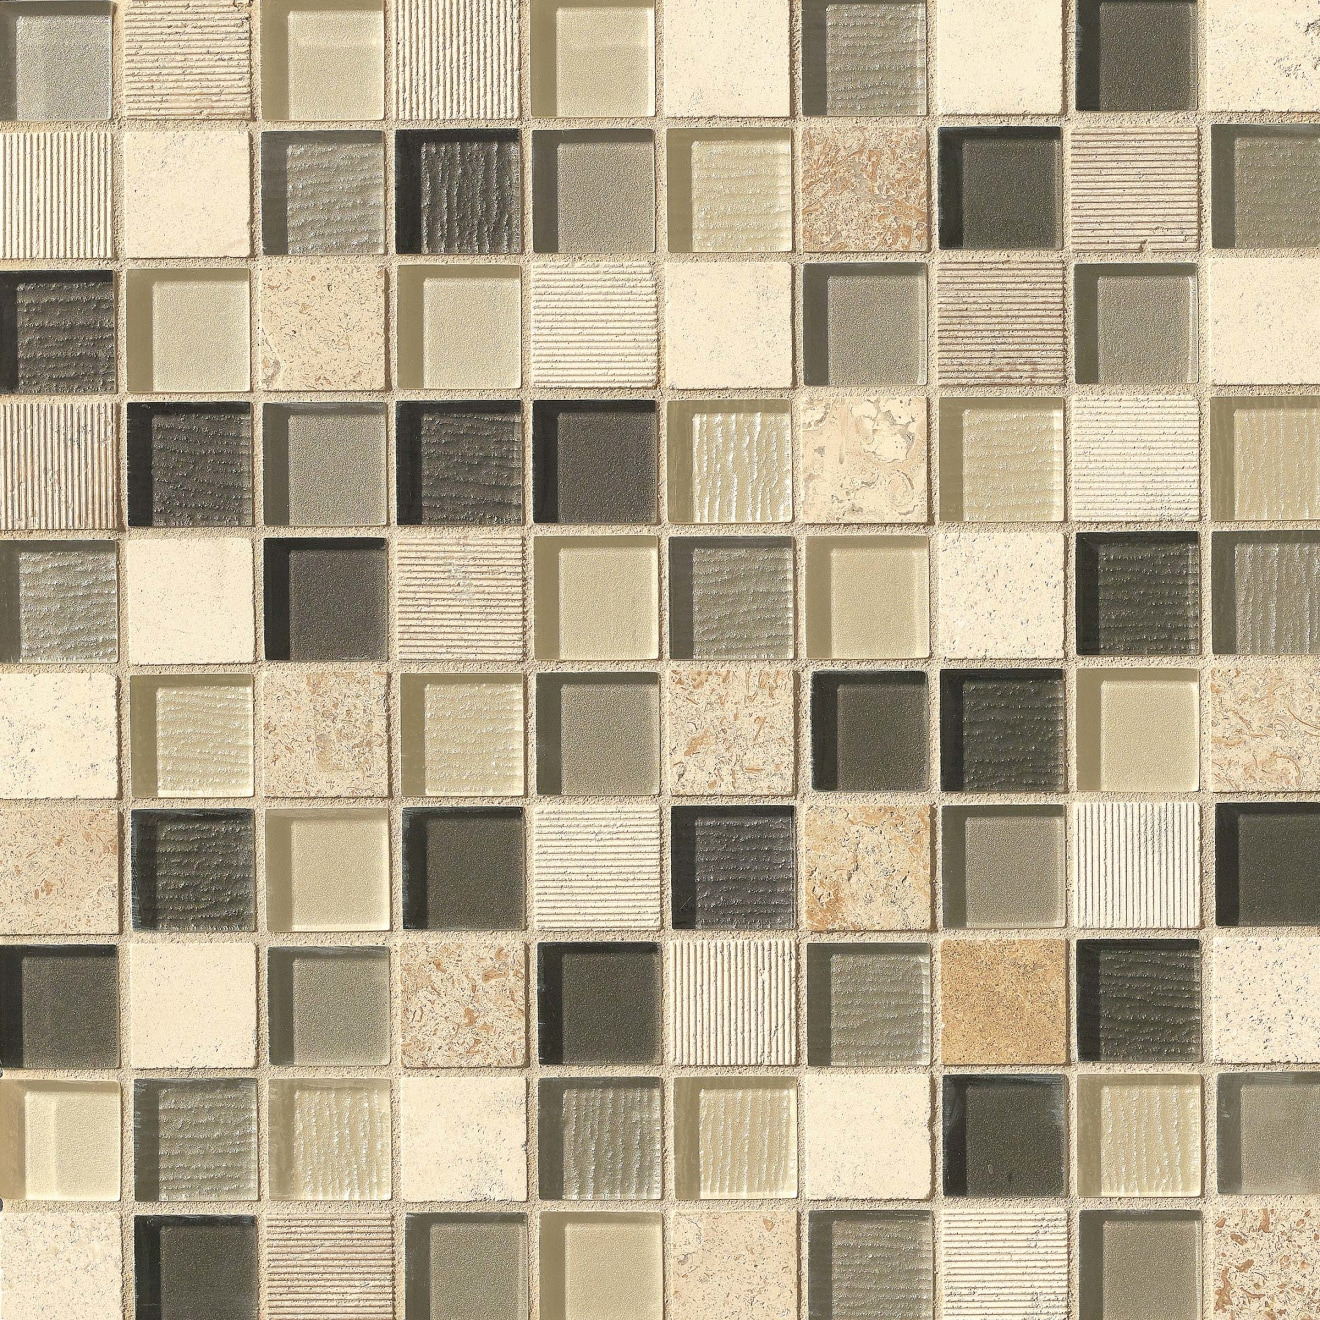 "Verve 1-1/8"" x 1-1/8"" Wall Mosaic in Valiant"